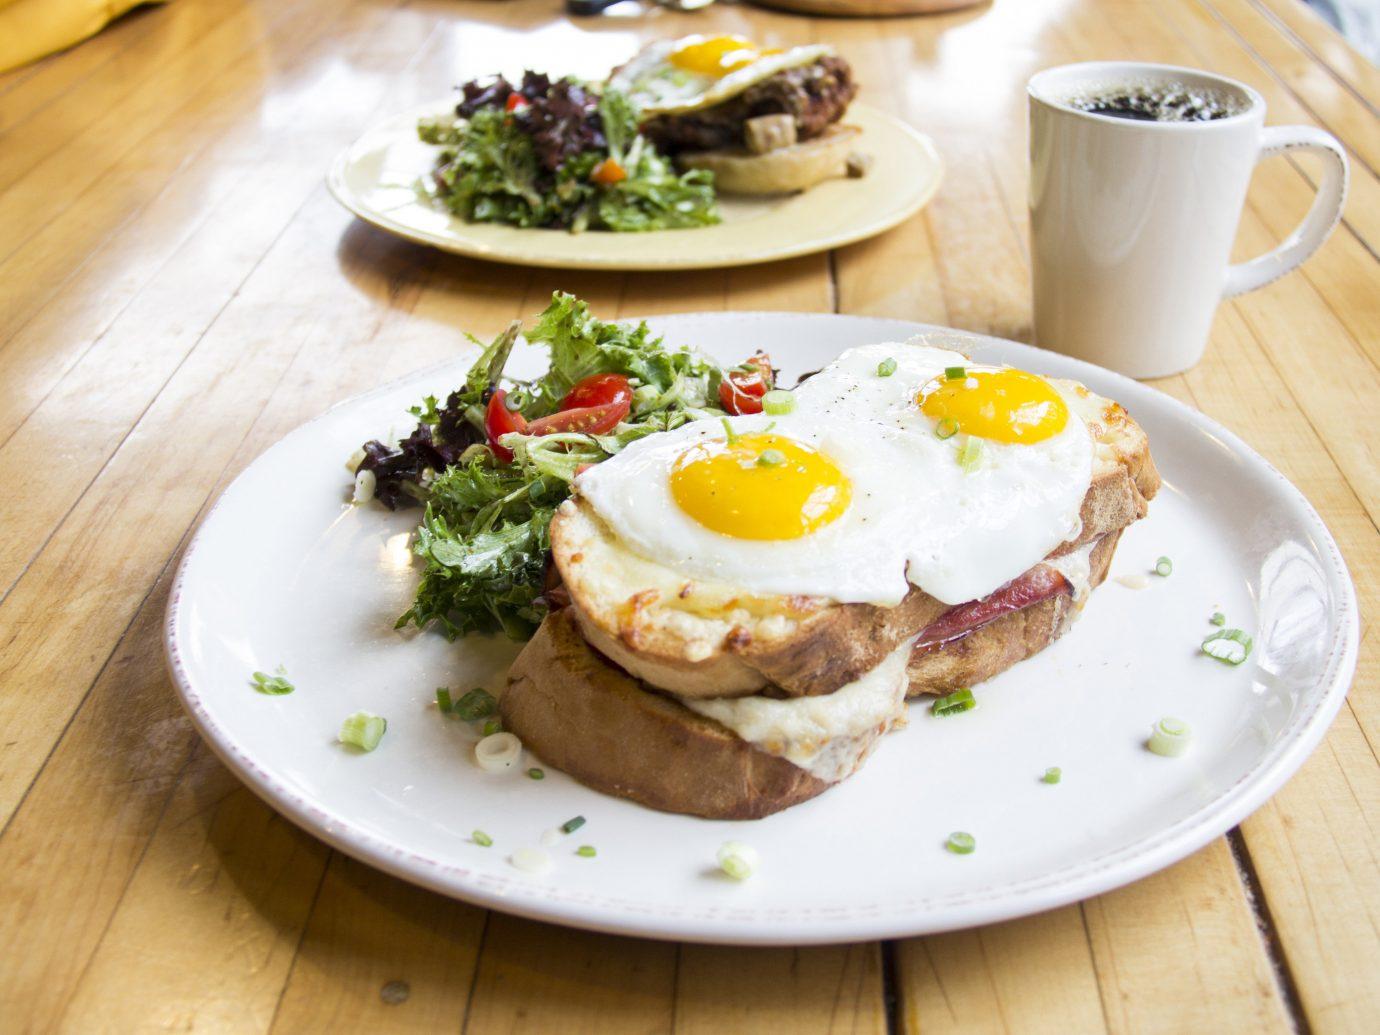 Secret Getaways Trip Ideas table plate food floor dish meal breakfast meat wooden restaurant produce lunch brunch steak cuisine wood